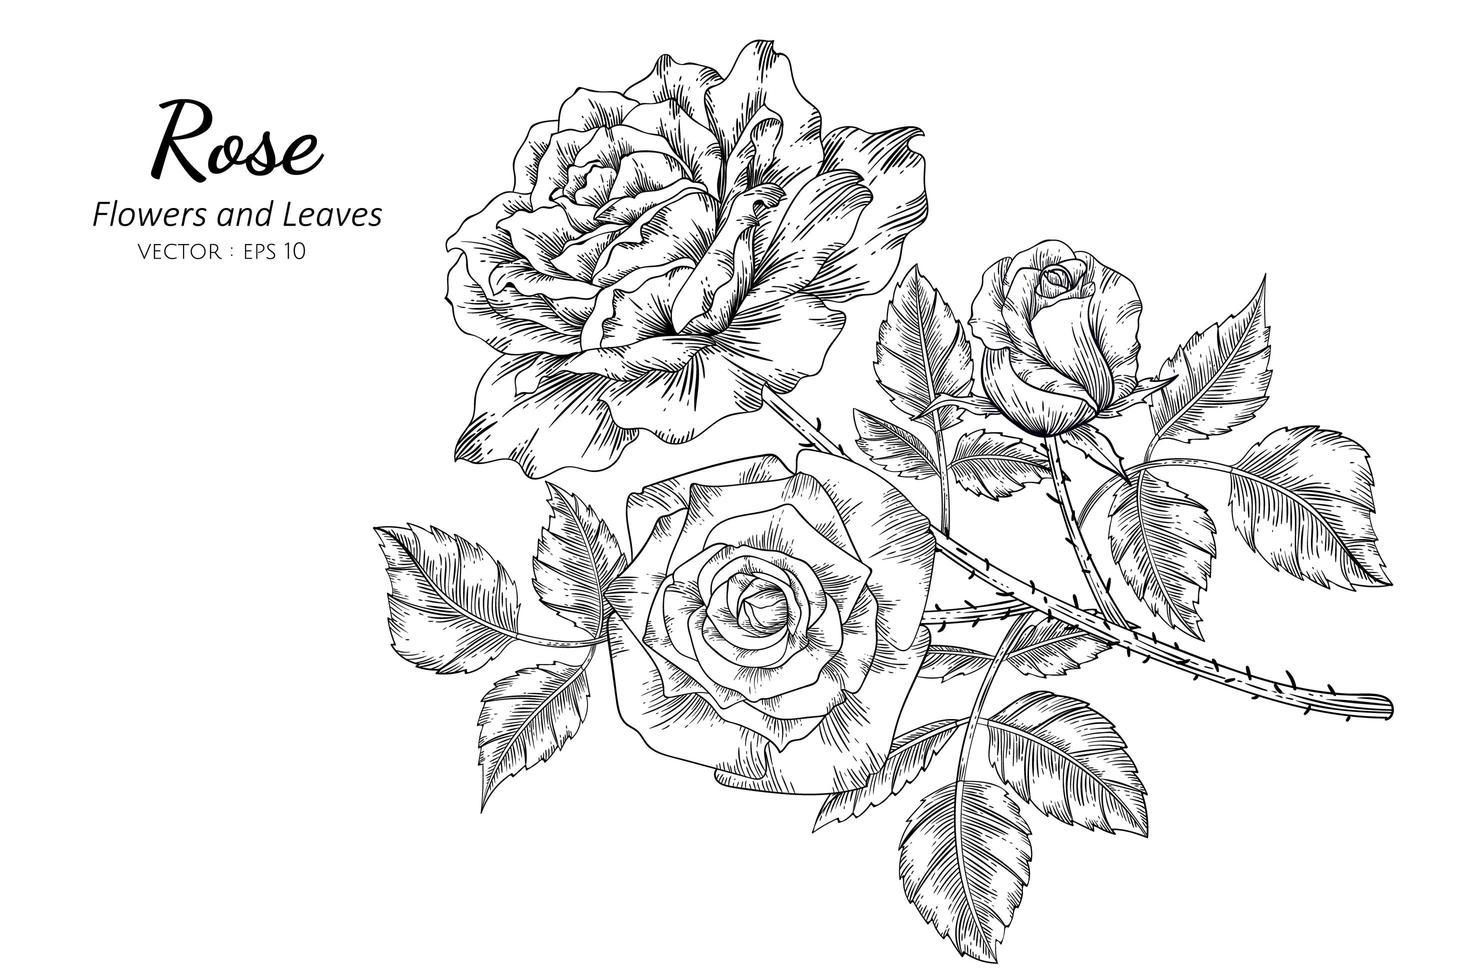 Rosenblüte und Blätter vektor